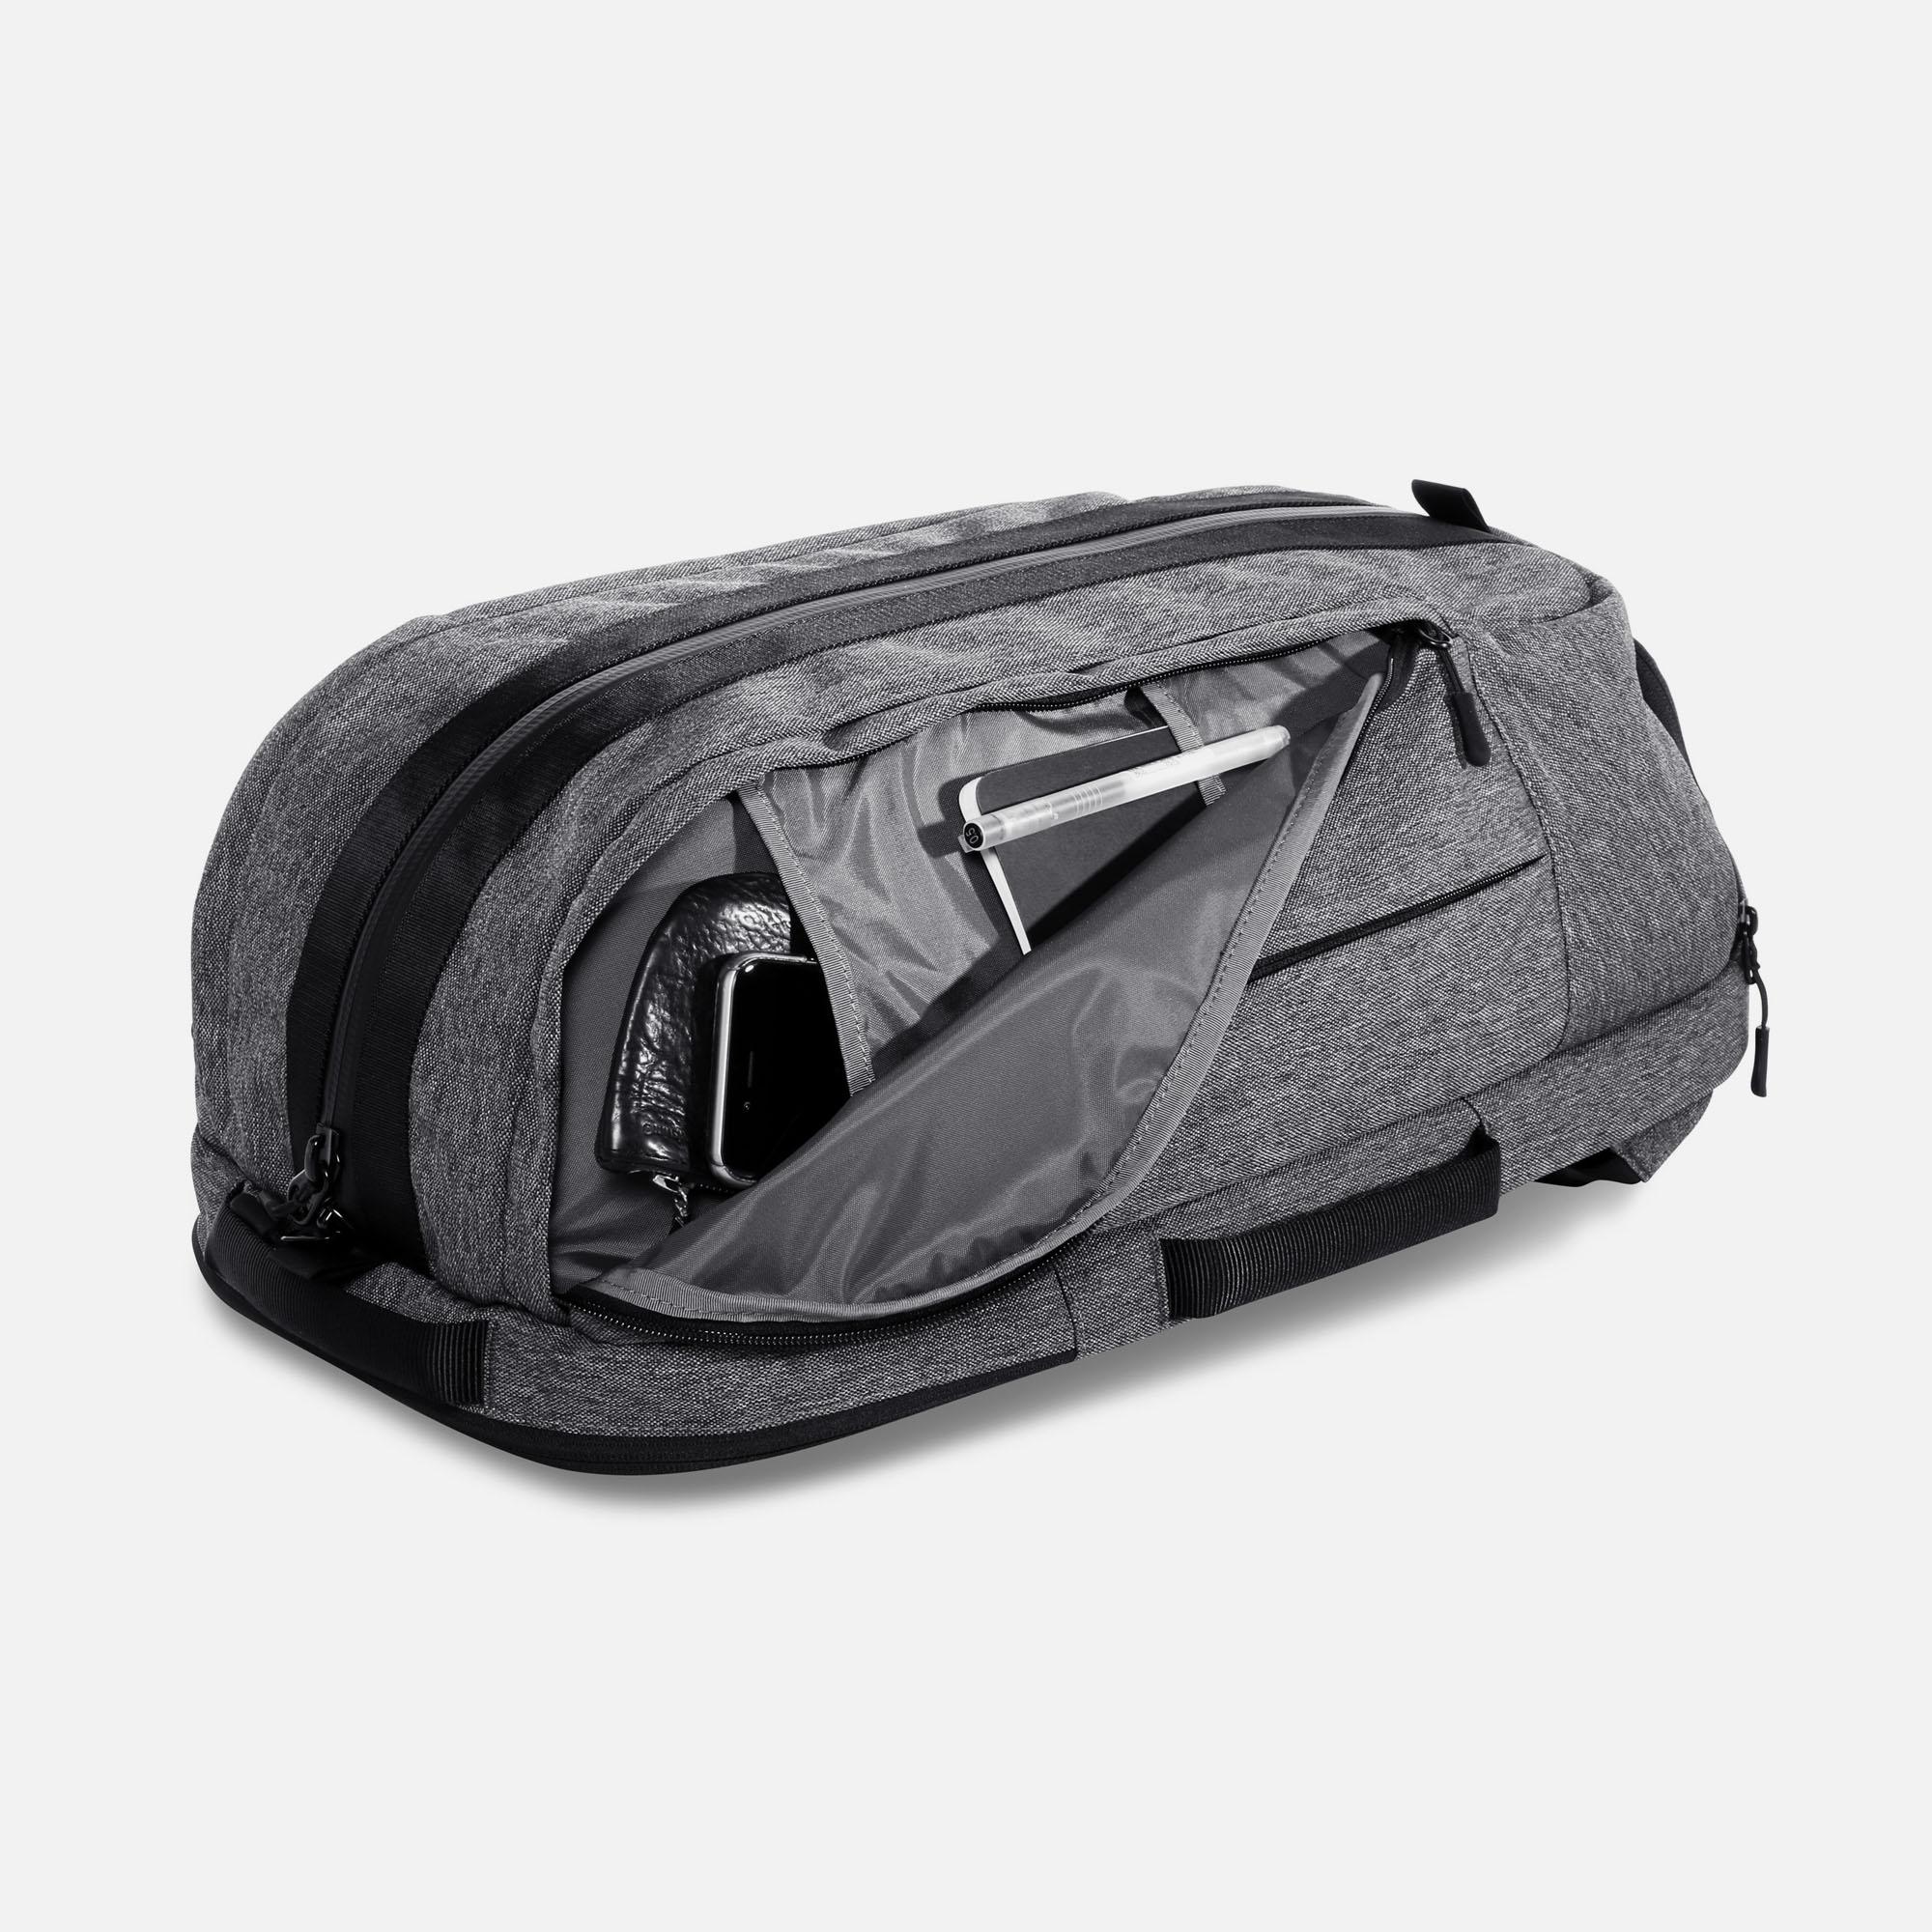 aer00014_duffelpack_sidepockets.jpg